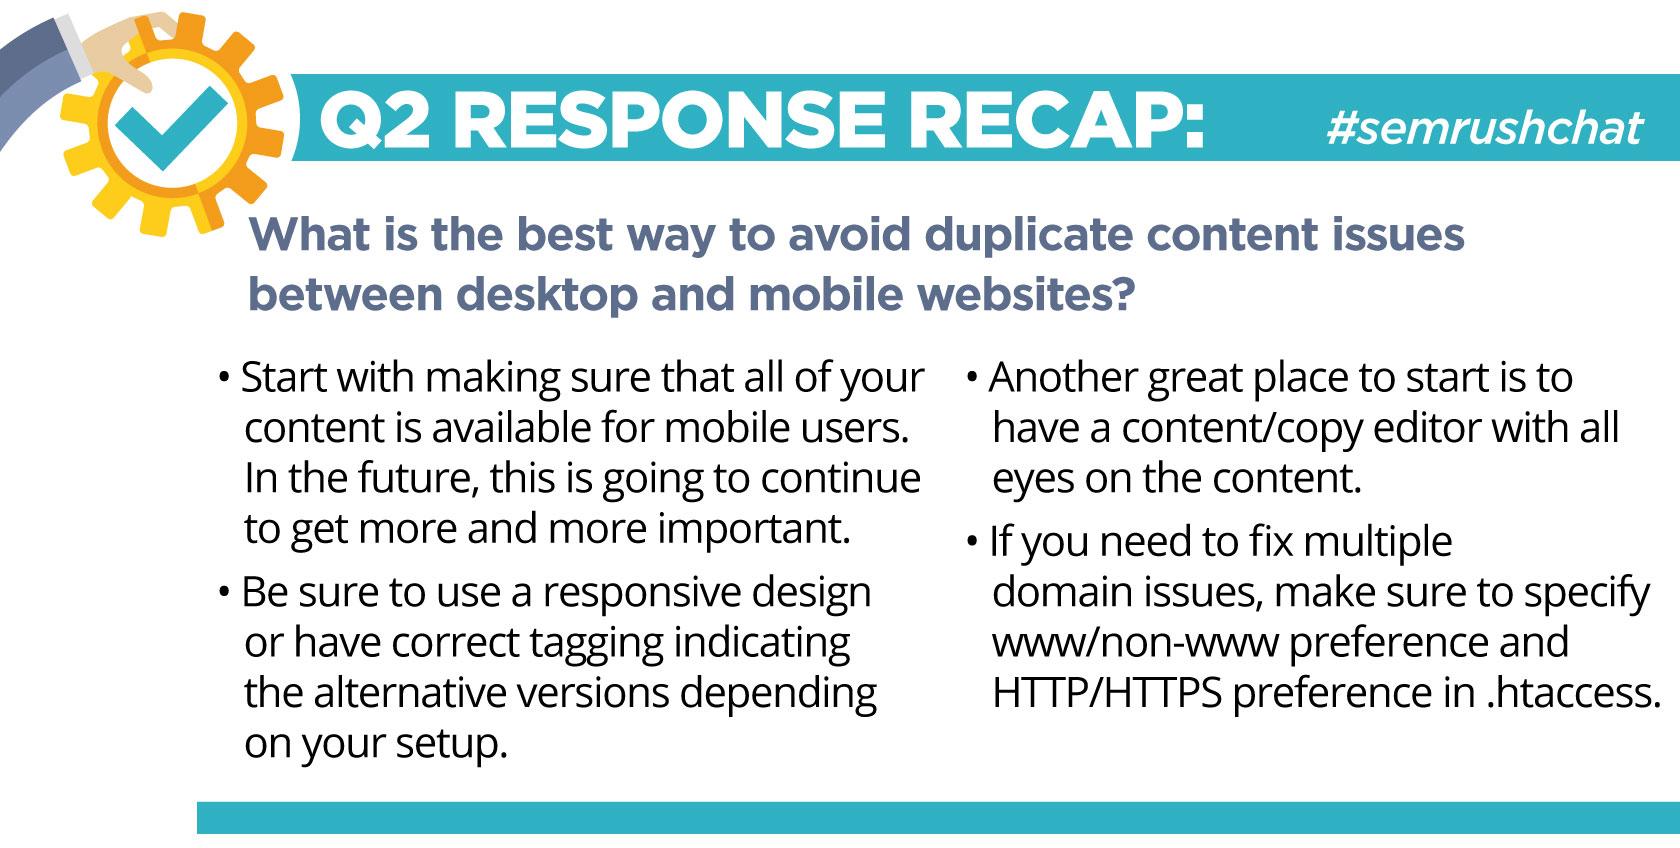 Q2 Response Recap